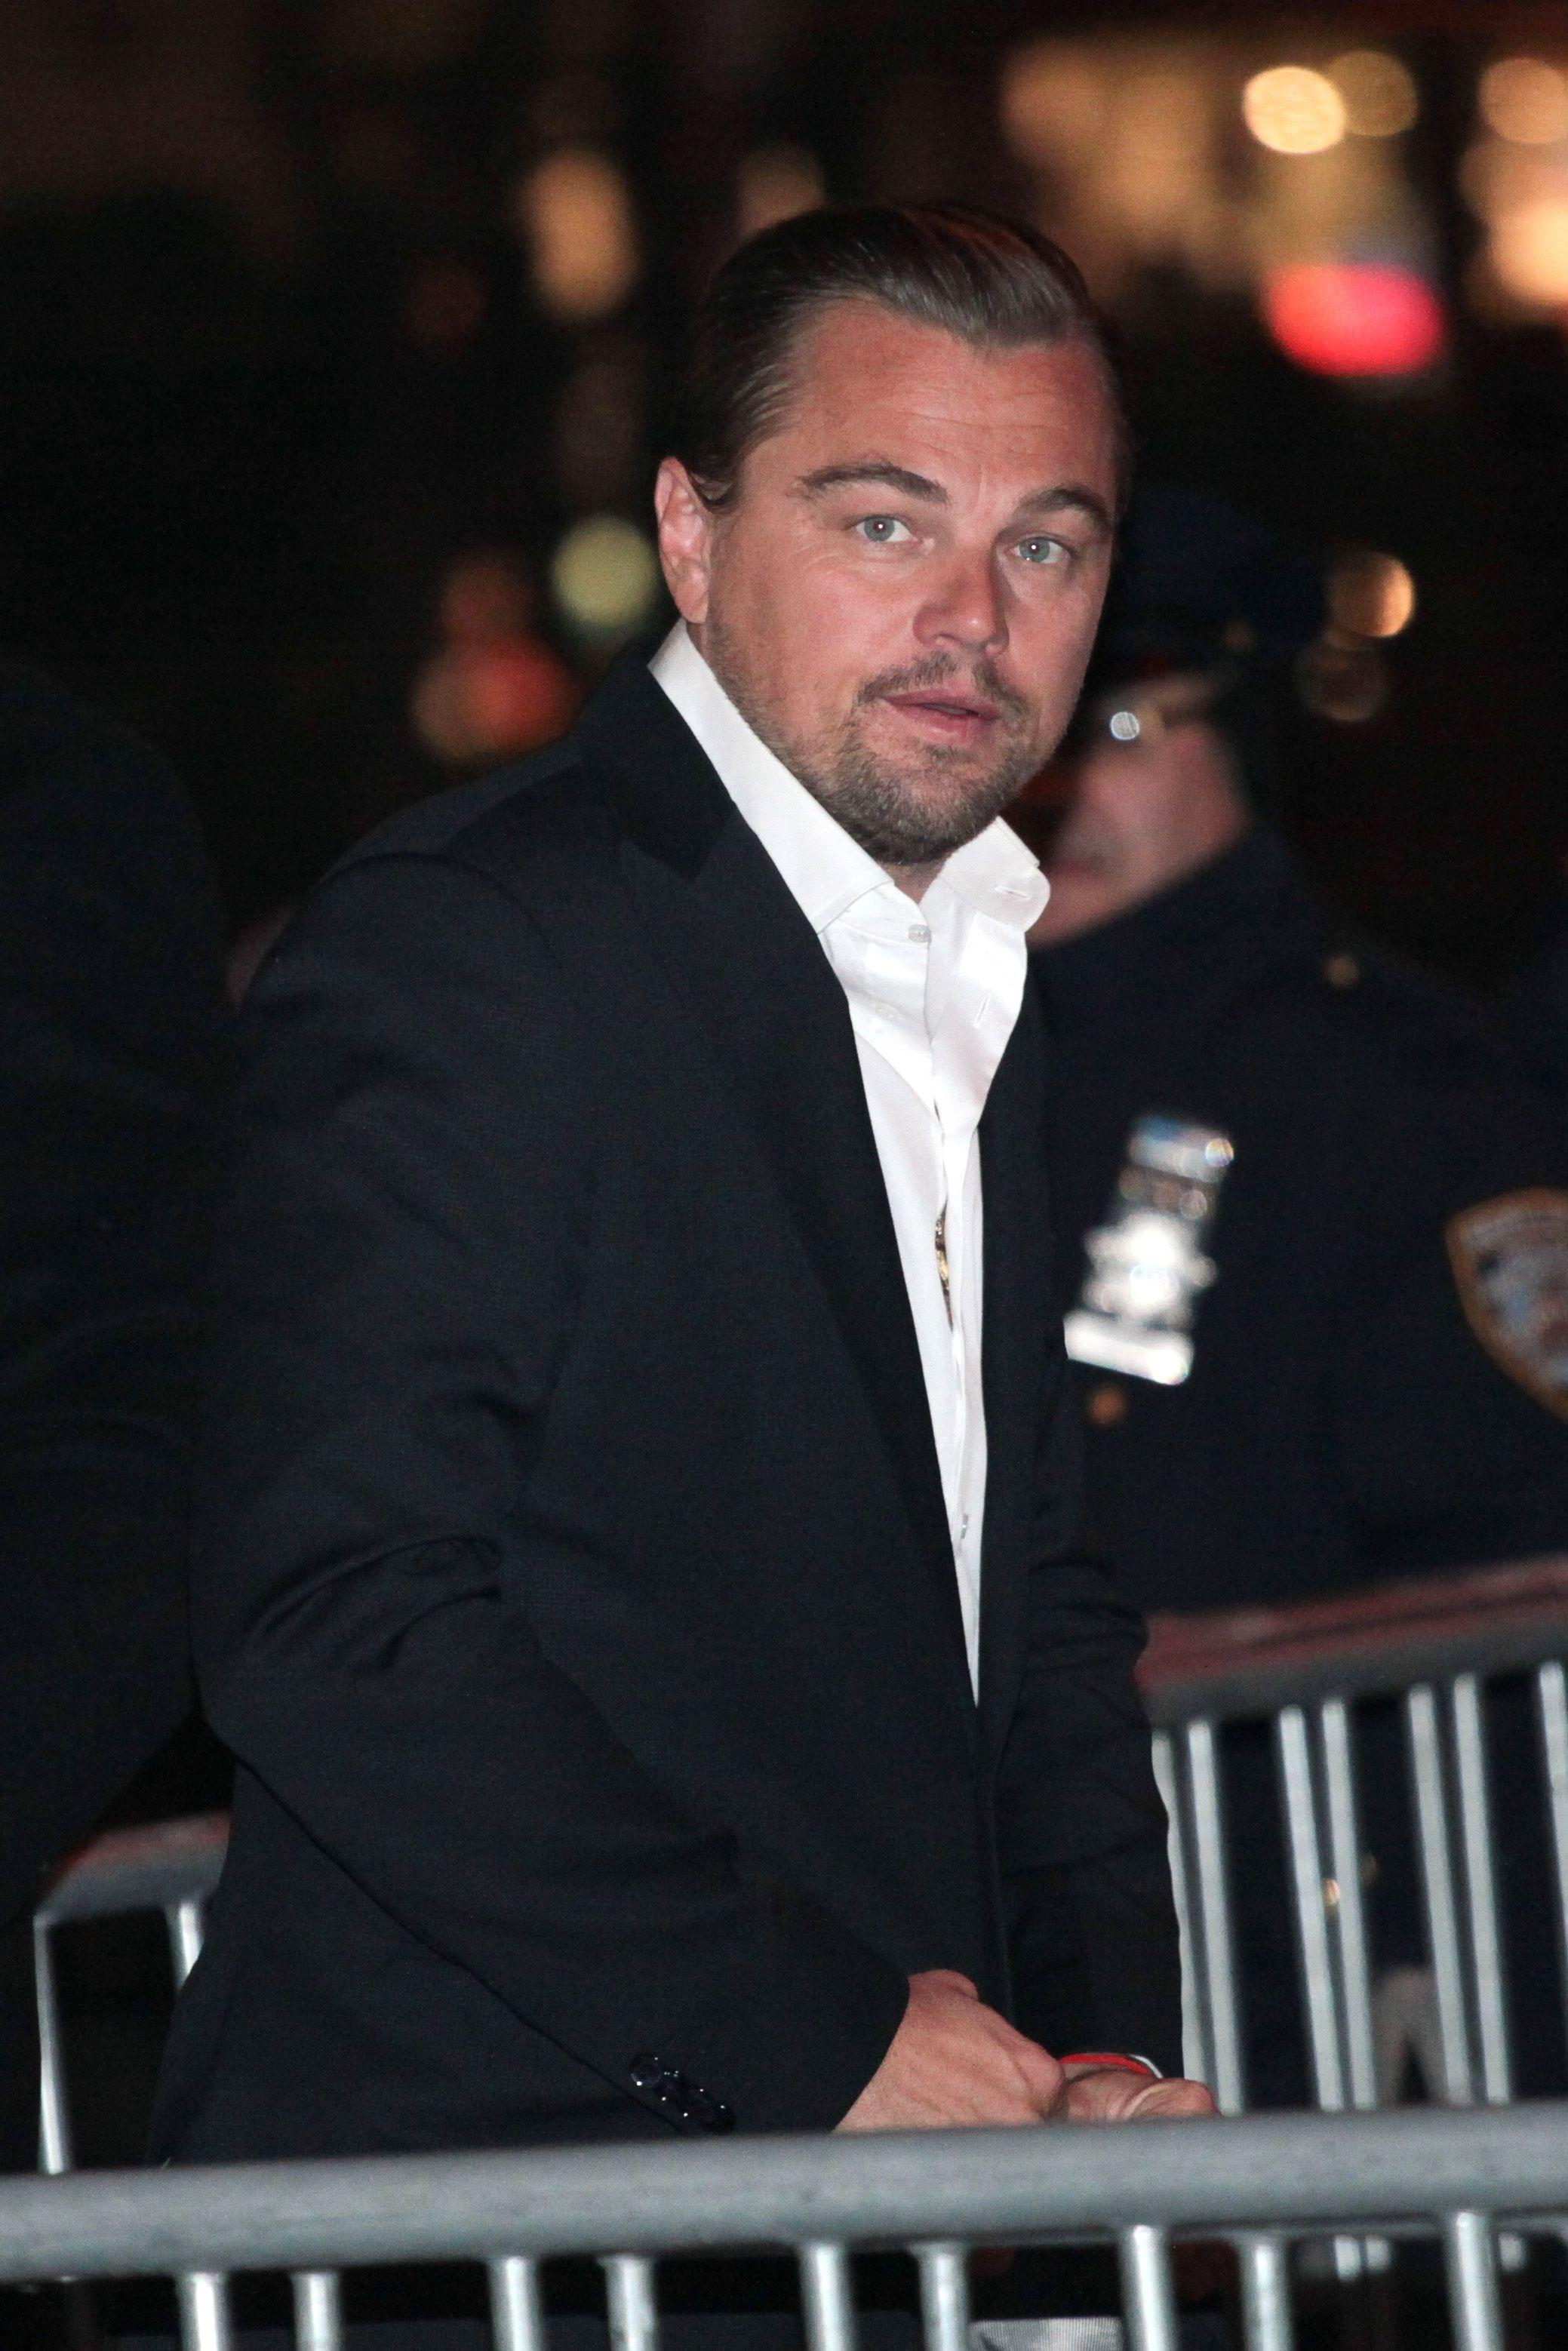 Leonardo DiCaprio shows his Beyhive stripes